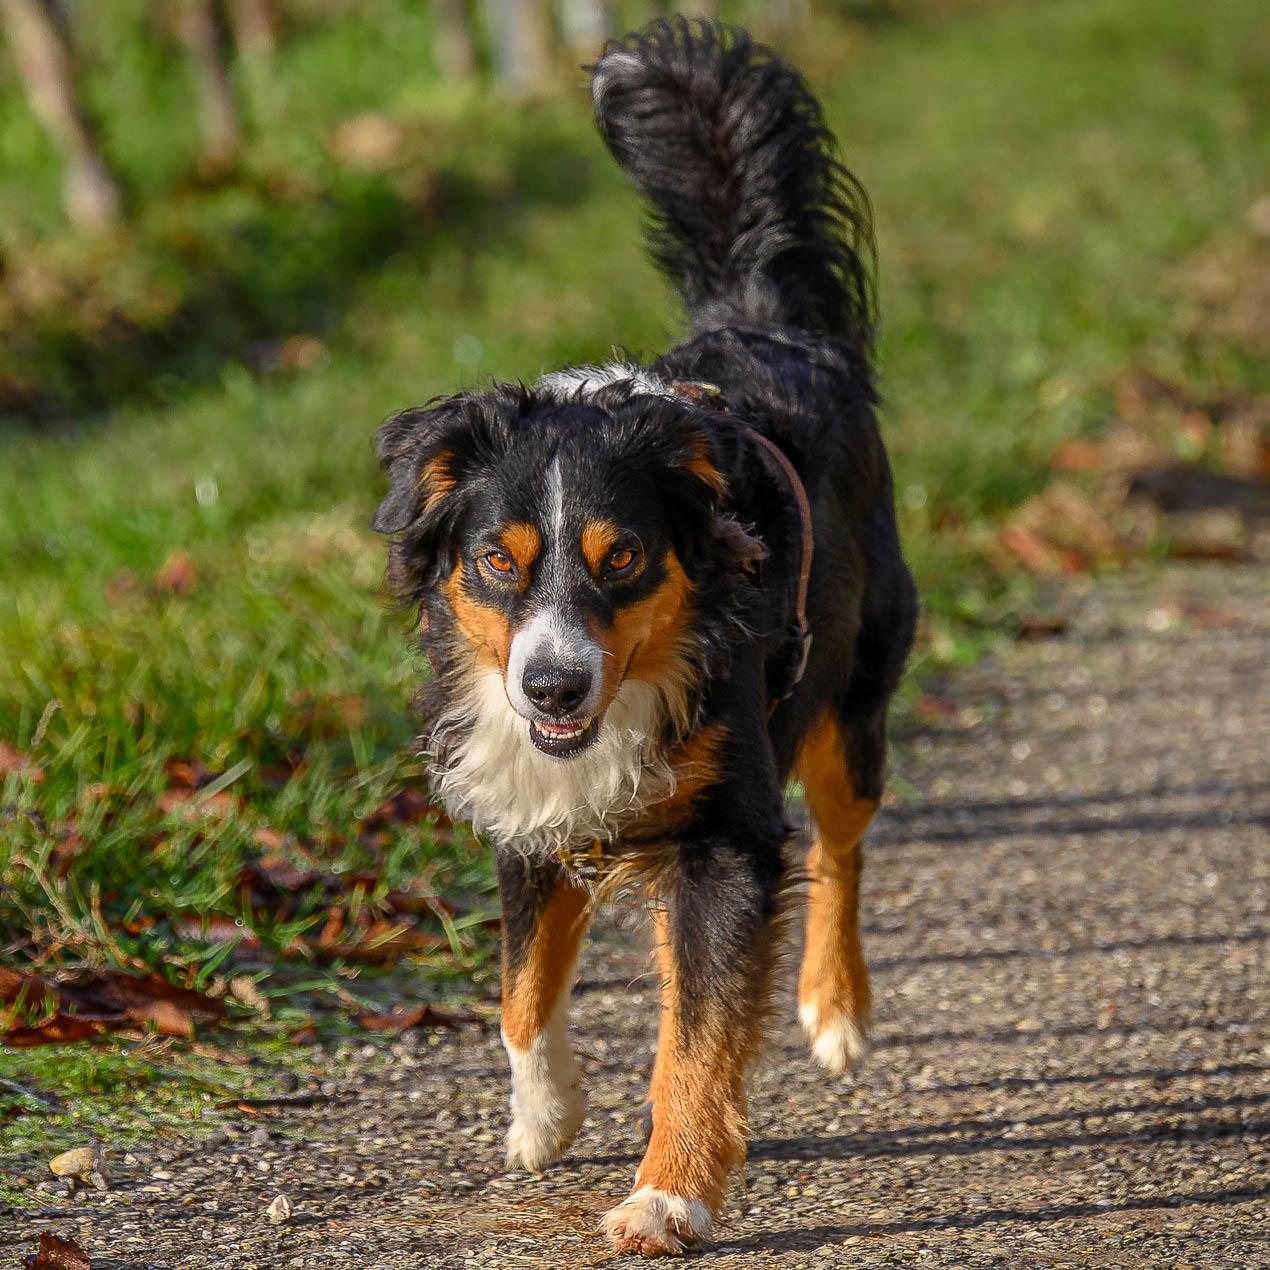 Hund mit erhobener Rute - Körpersprache Hund